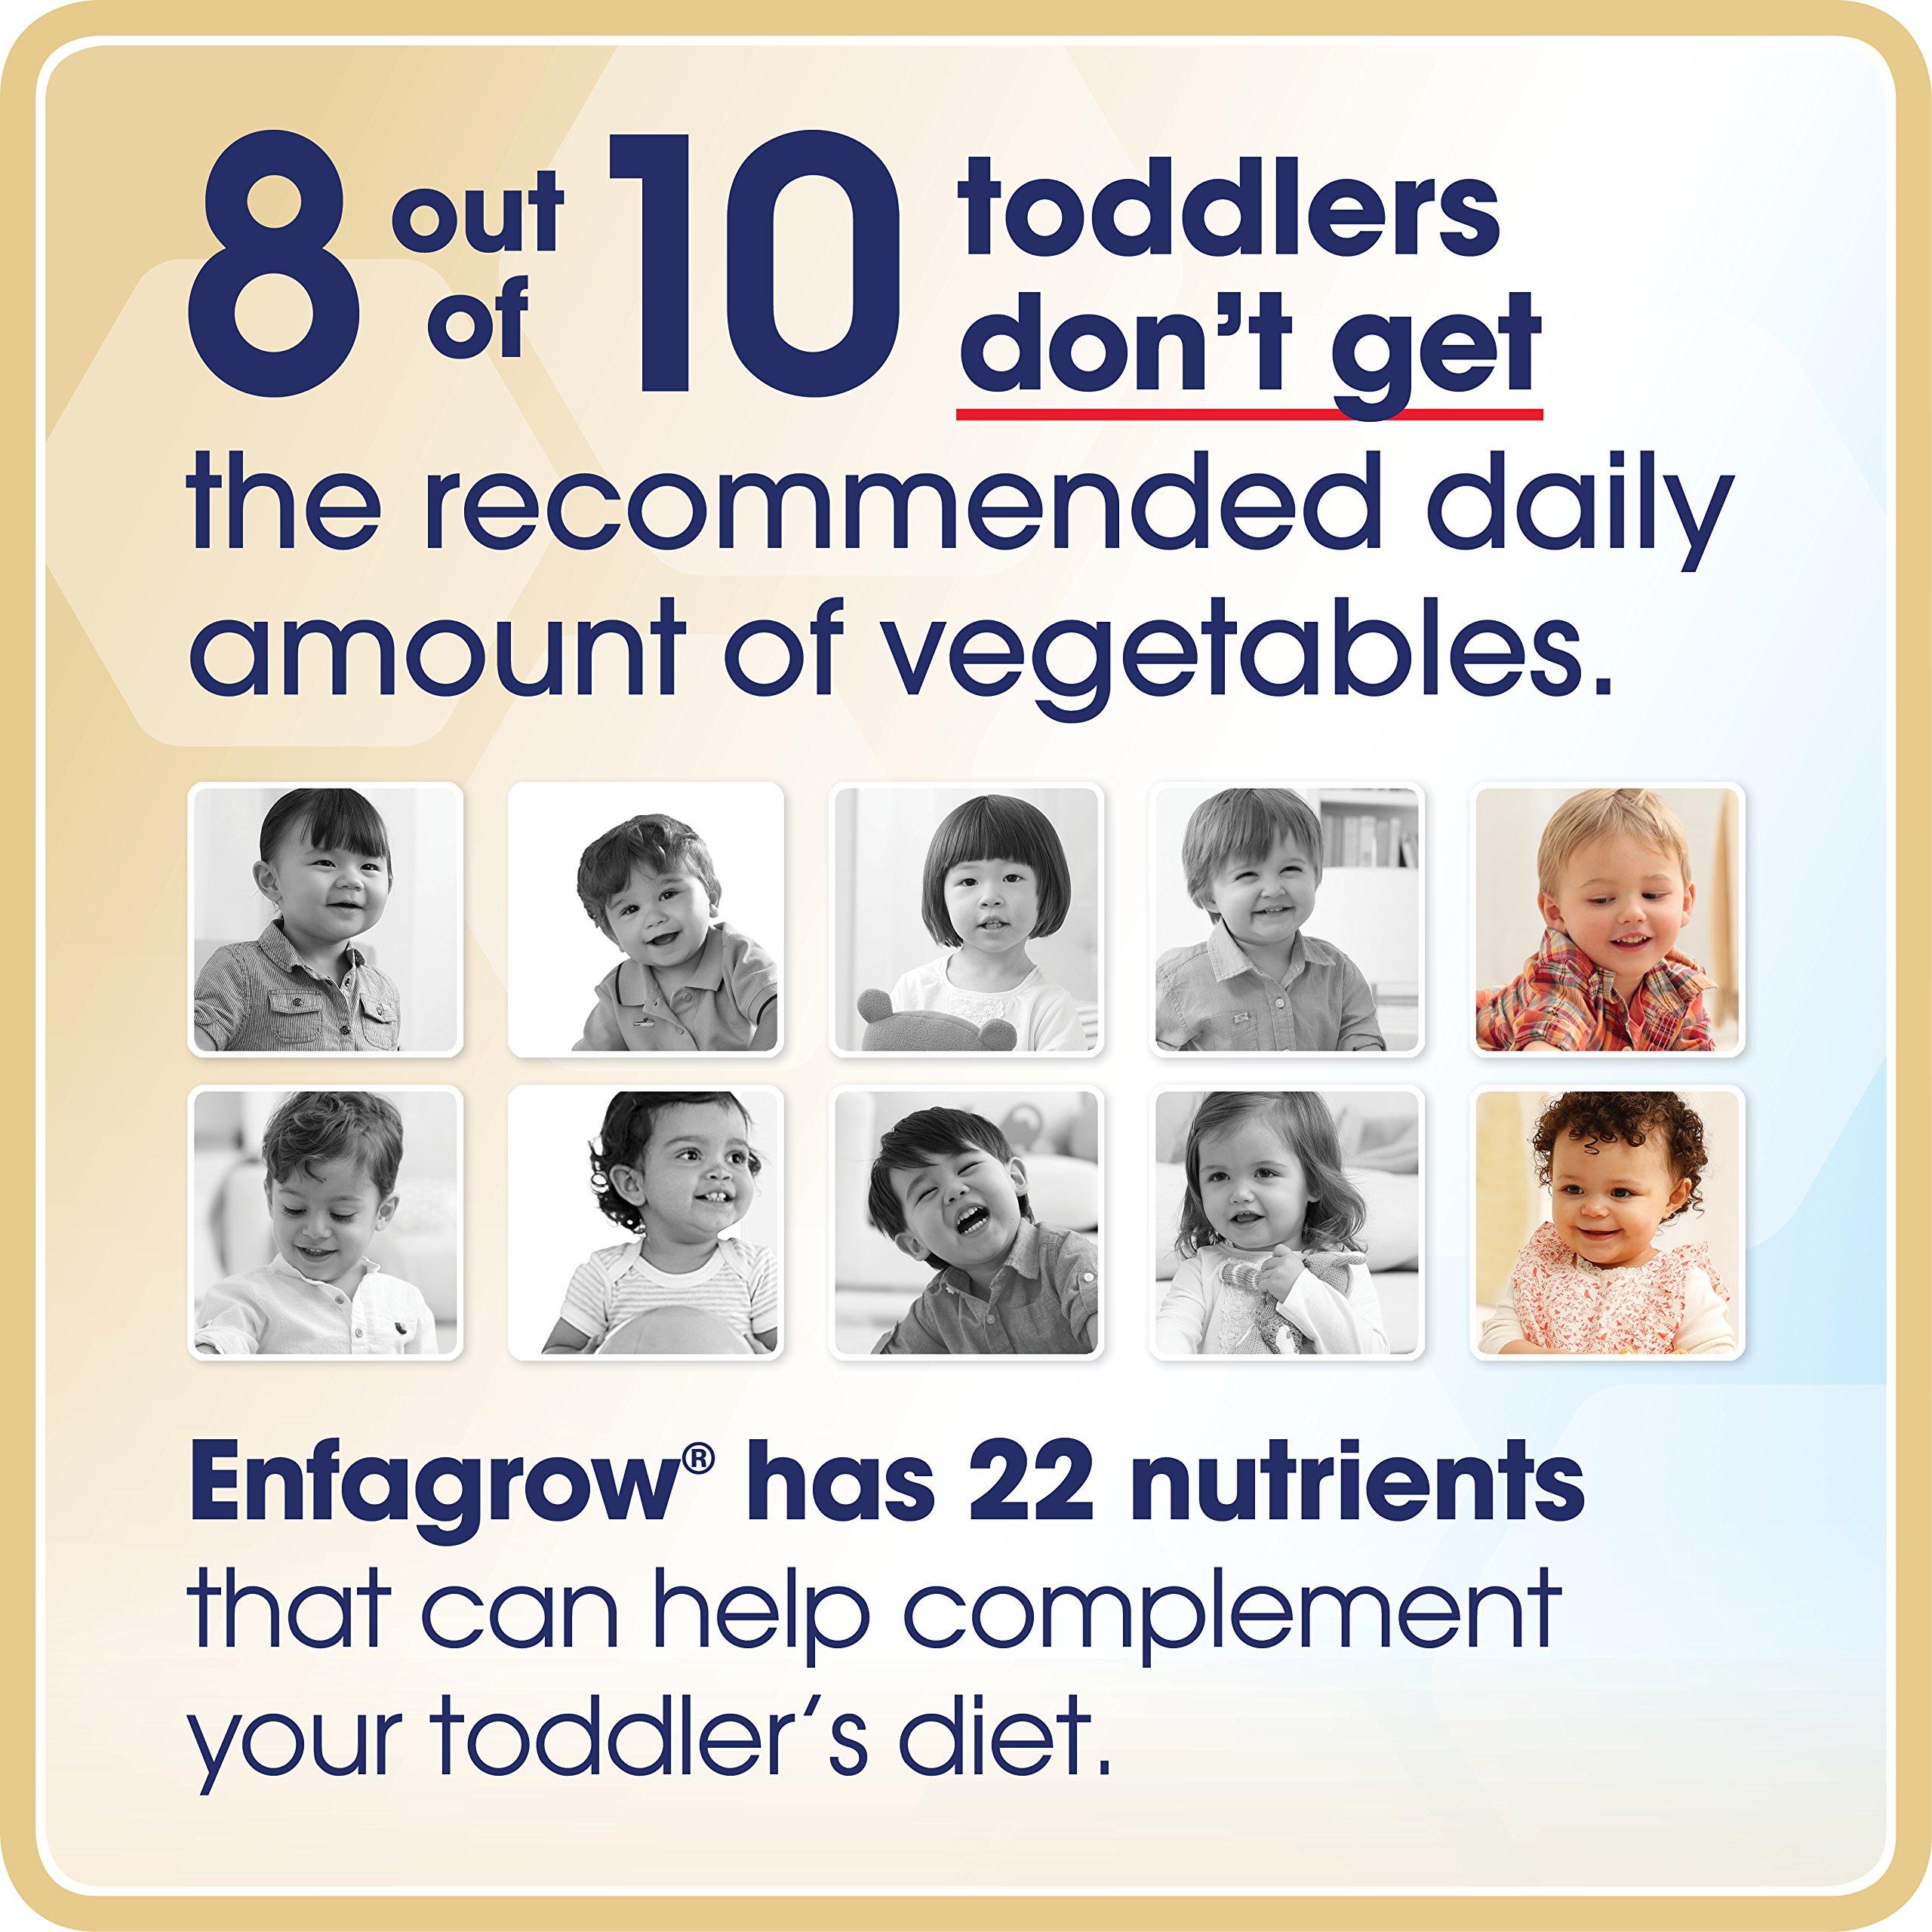 Enfagrow PREMIUM Toddler Next Step, Vanilla Flavor - Ready to Use Liquid, 8 fl oz, (24 count) by Enfagrow Next Step (Image #7)